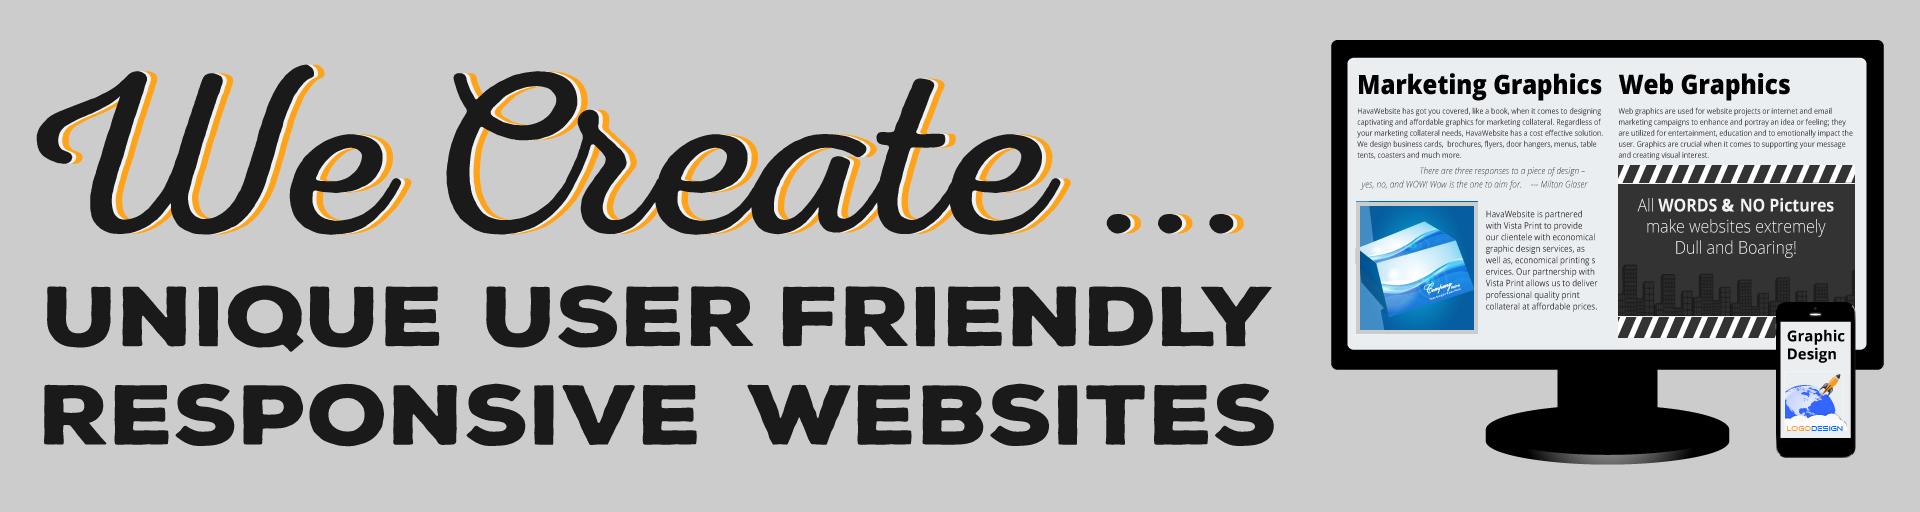 havawebsite responsive website design service